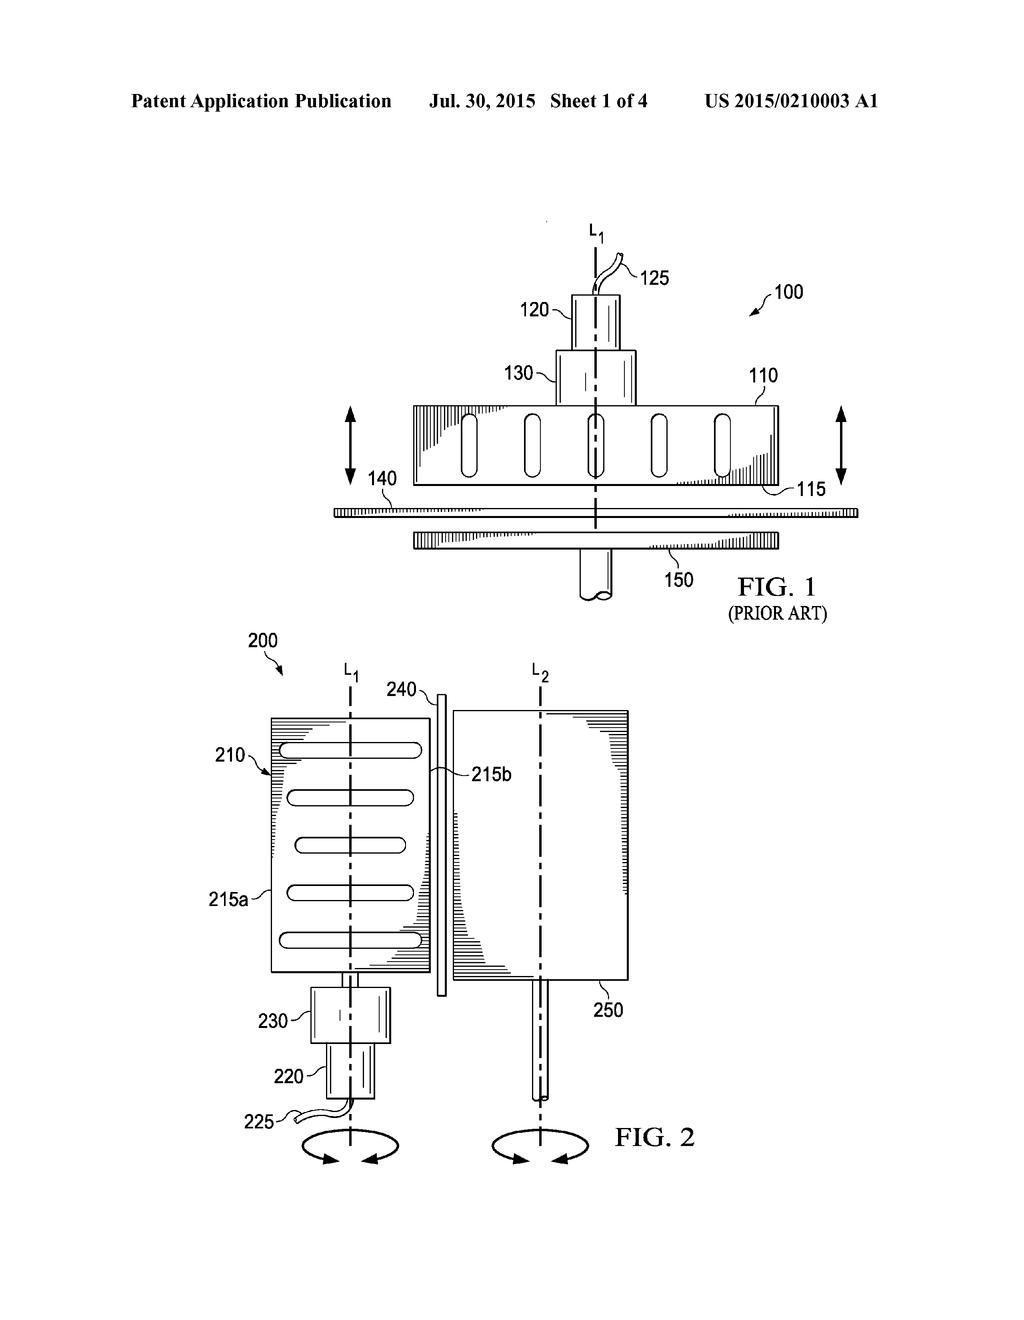 Ultrasonic Welding Circuit Diagram Wiring Schematics Generator Transverse Sonotrode Design For Machine